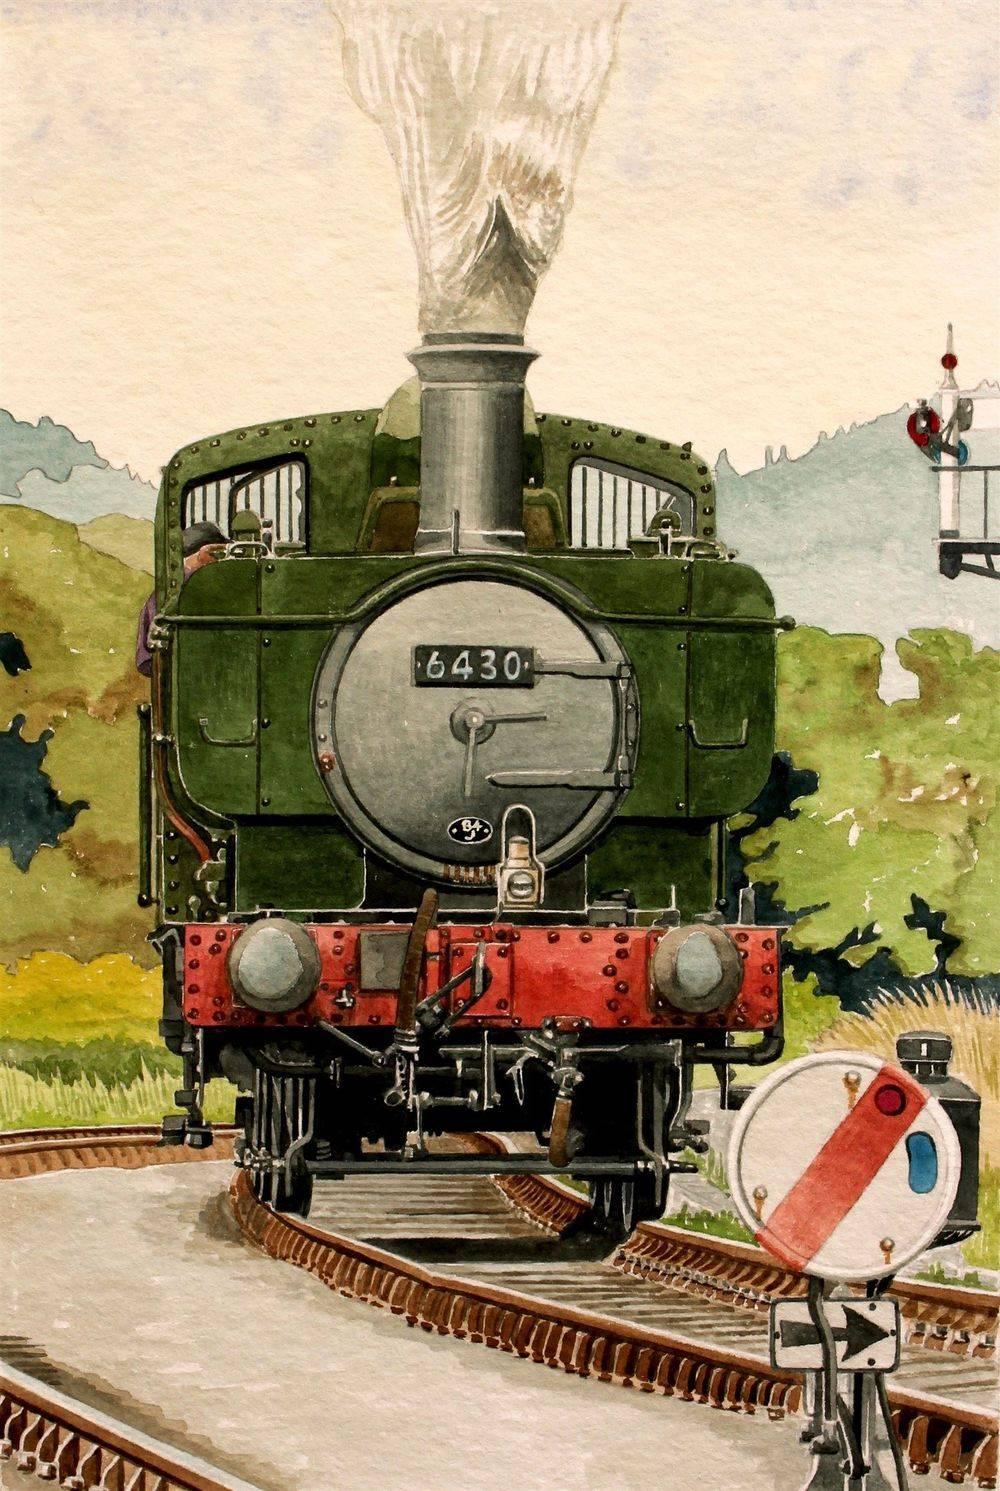 0-6-0 Pannier Tank Engine on the Llangollen railway (Image Approx 30 x 22cms) : Watercolour £135